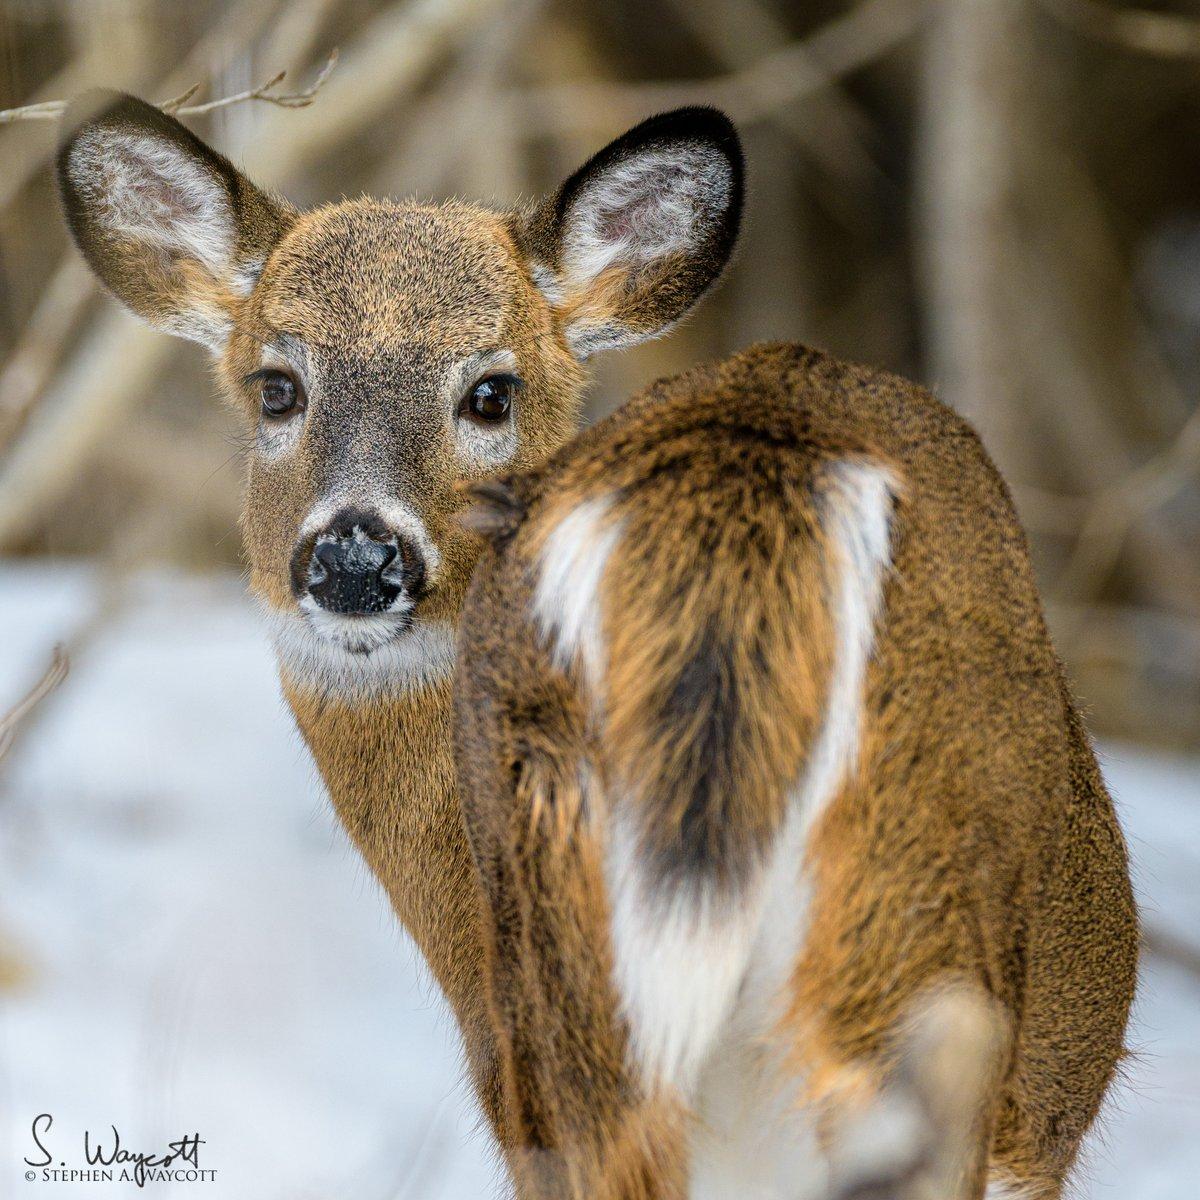 Does this tail make my butt look big?   Saint John, #NewBrunswick, Canada February 2020  #WhiteTailedDeer #deer #nature #wildlife #photography #naturephotography #wildlifephotography #Nikon #D850 #Sigma500sport pic.twitter.com/wVjwYoAy0B